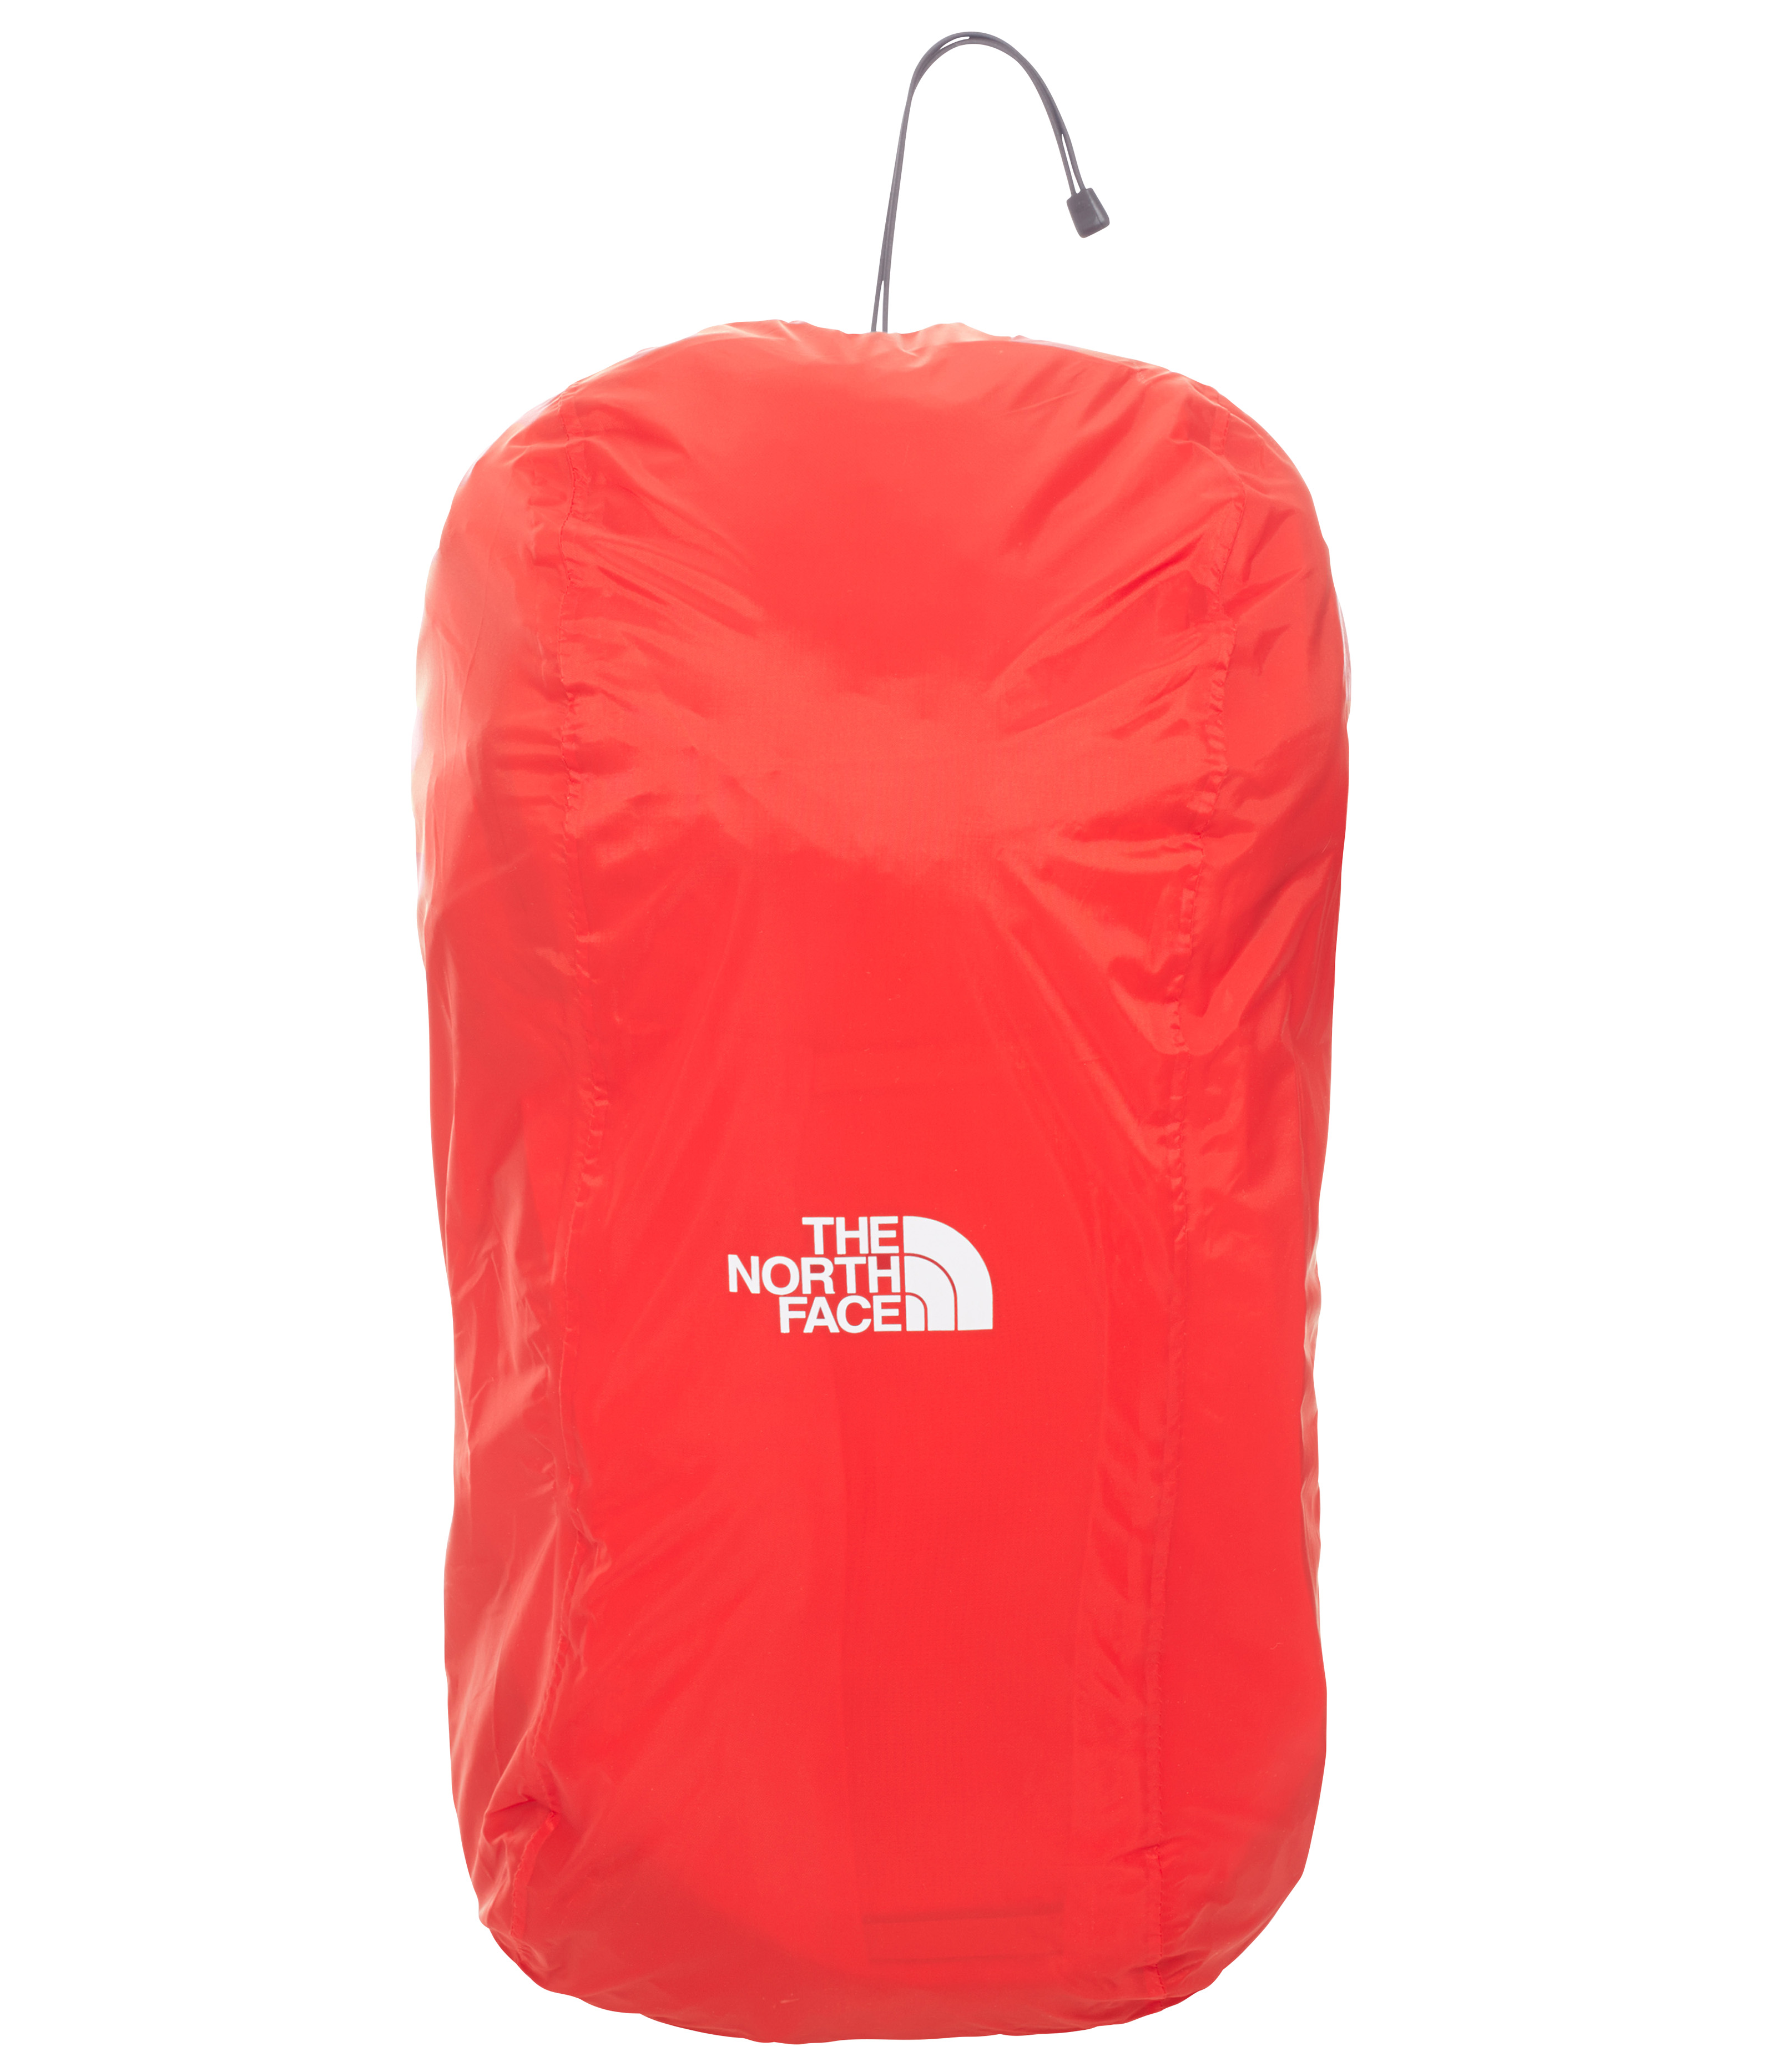 The North Face pláštěnka na batoh NEPROMOKAVÝ POTAH NA BATOH RAIN PACK COVER